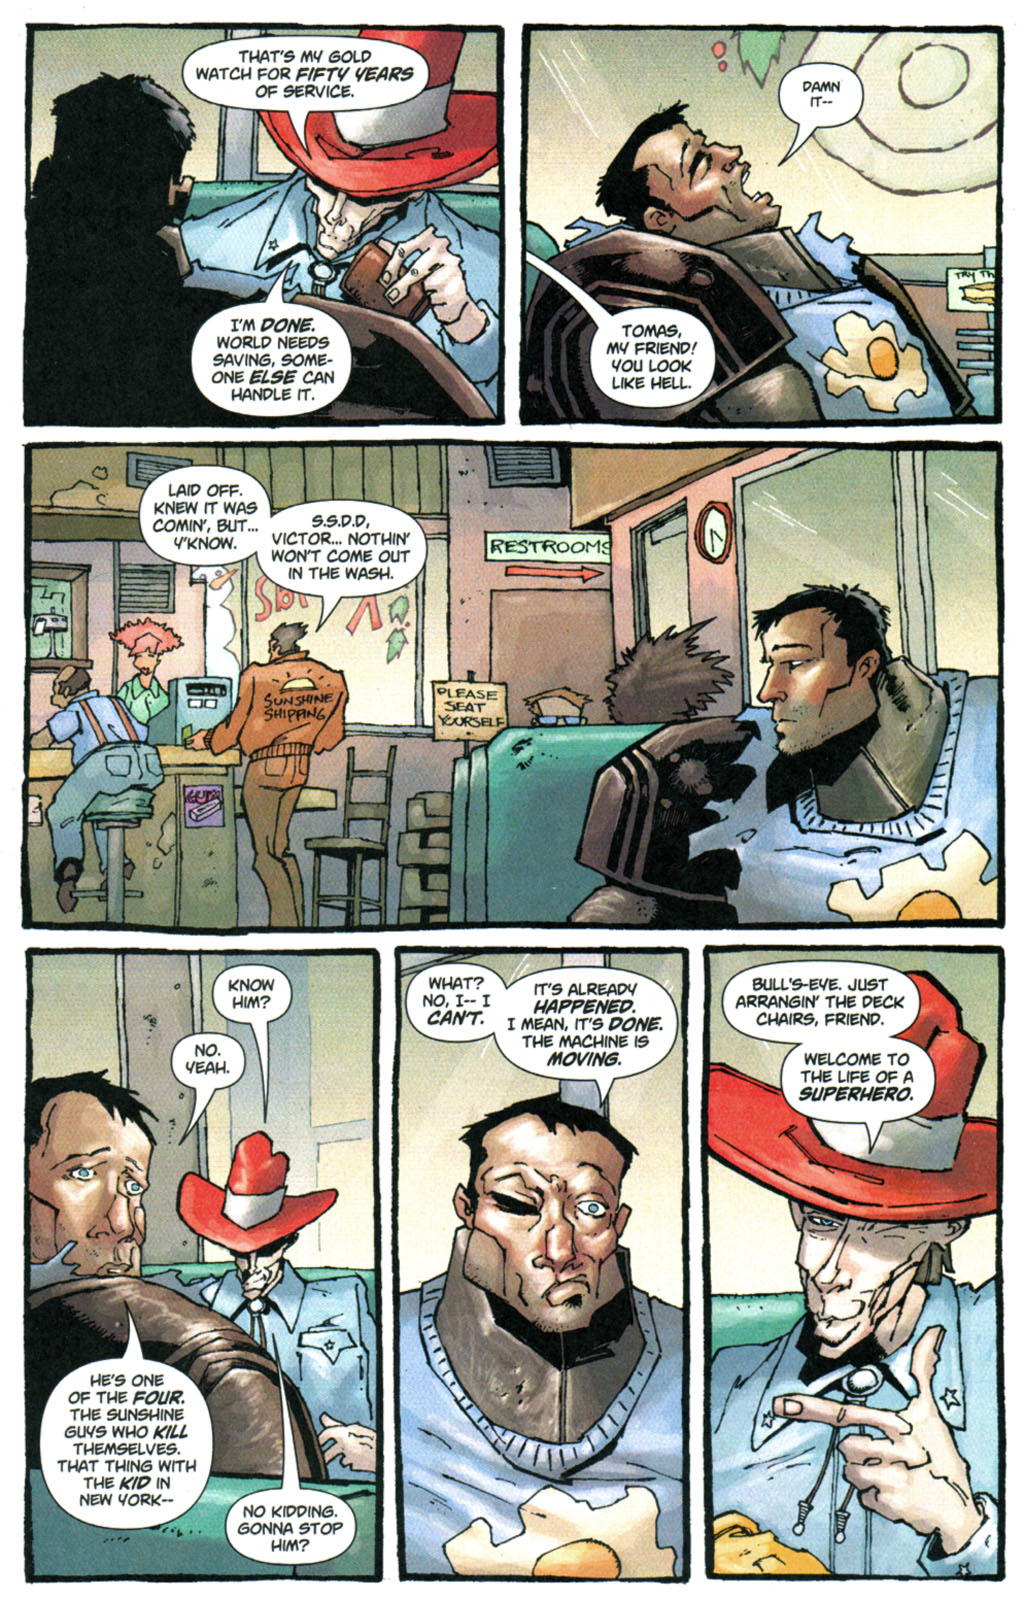 Read online Enginehead comic -  Issue #5 - 18